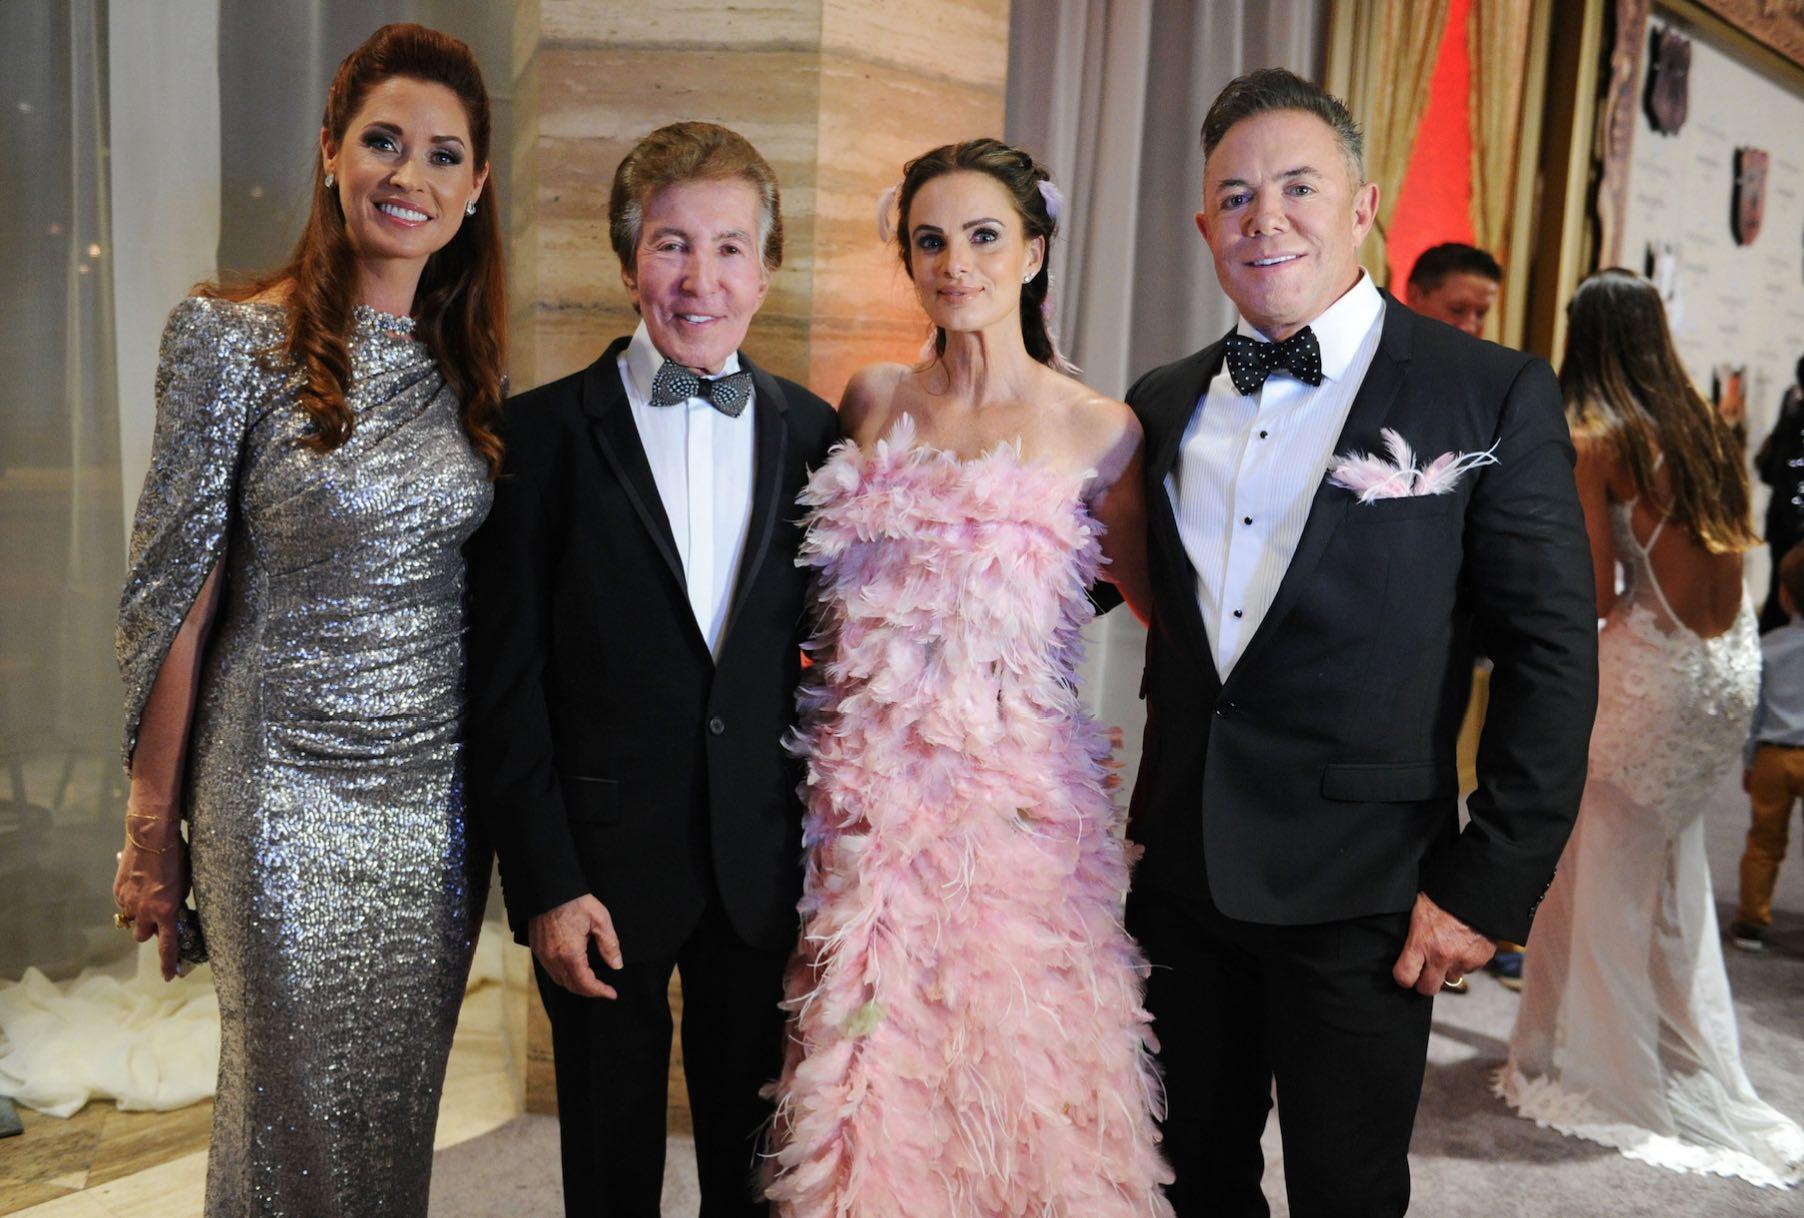 Nancy and Al Malnik, Gabrielle Anwar and Shareef Malnik at the 2016 Make-A-Wish Ball